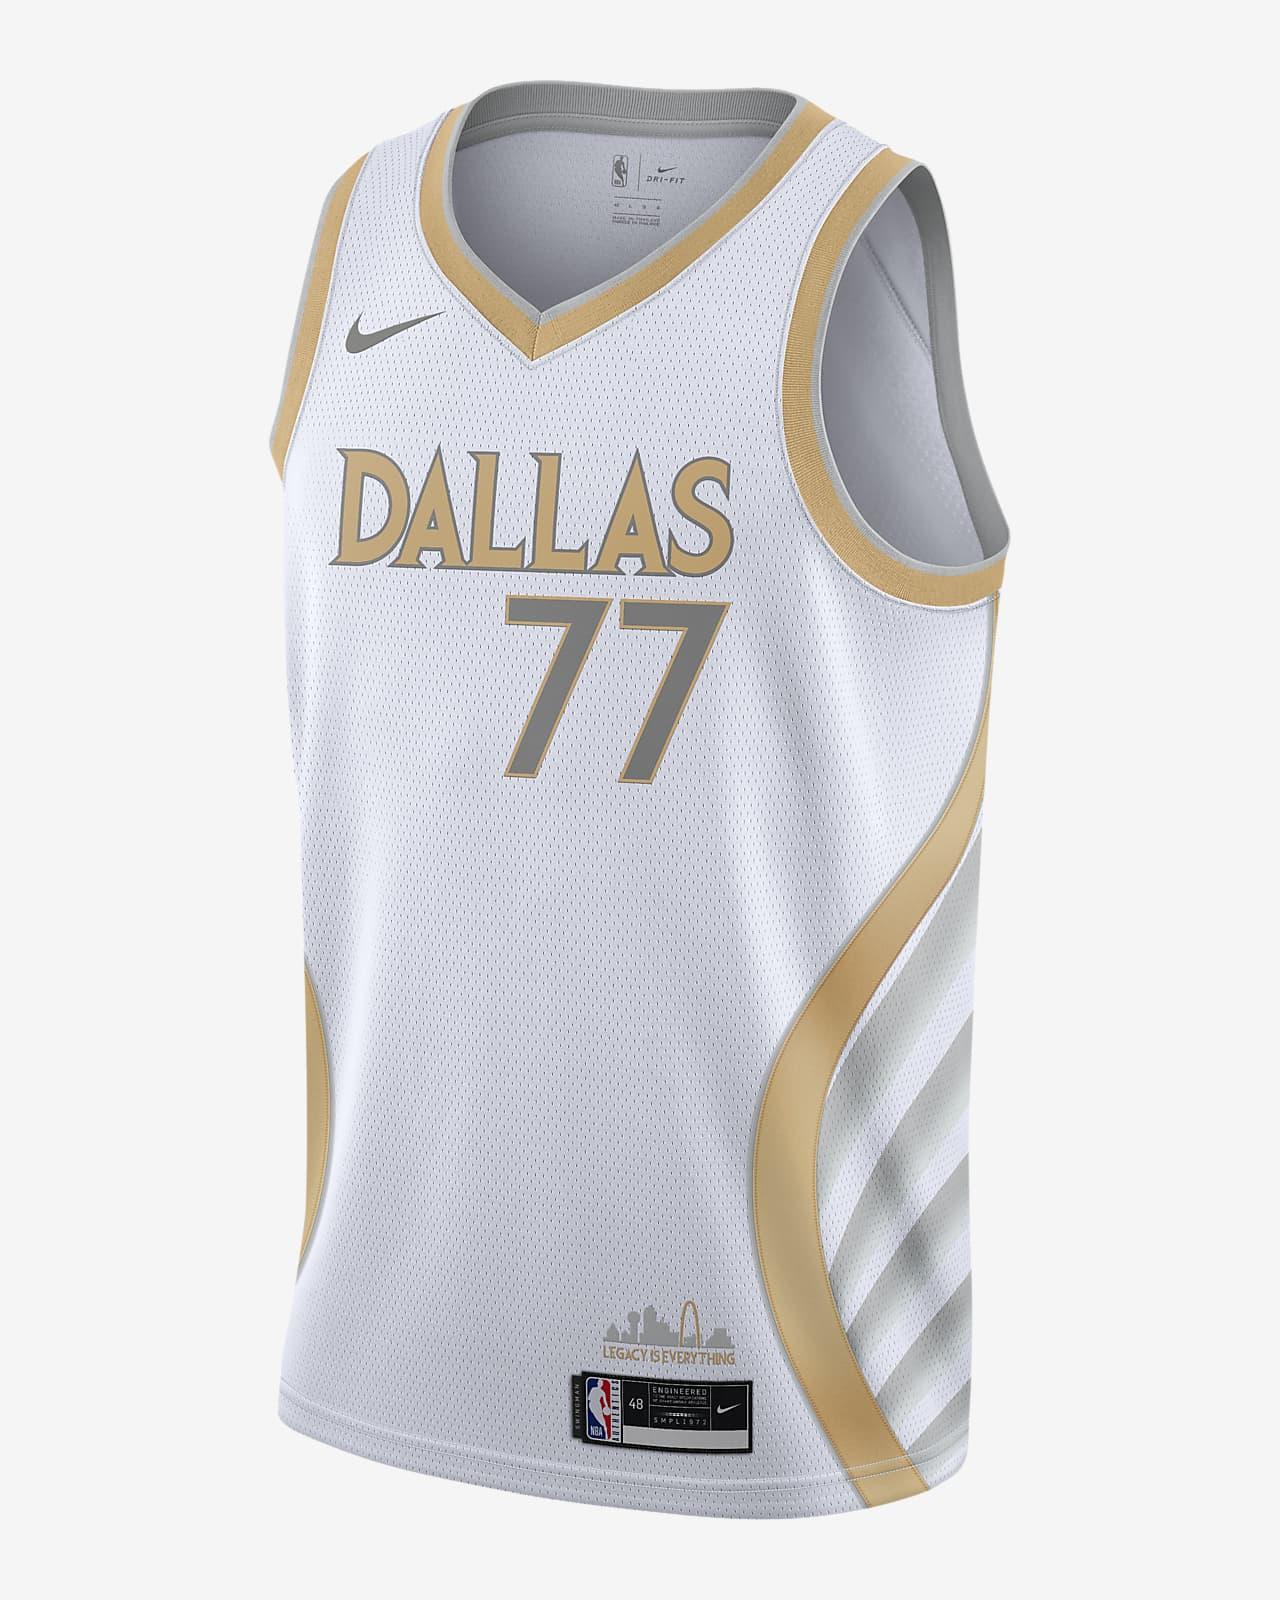 New Dallas Mavericks #77 Luka Doncic City version Basketball Jersey White